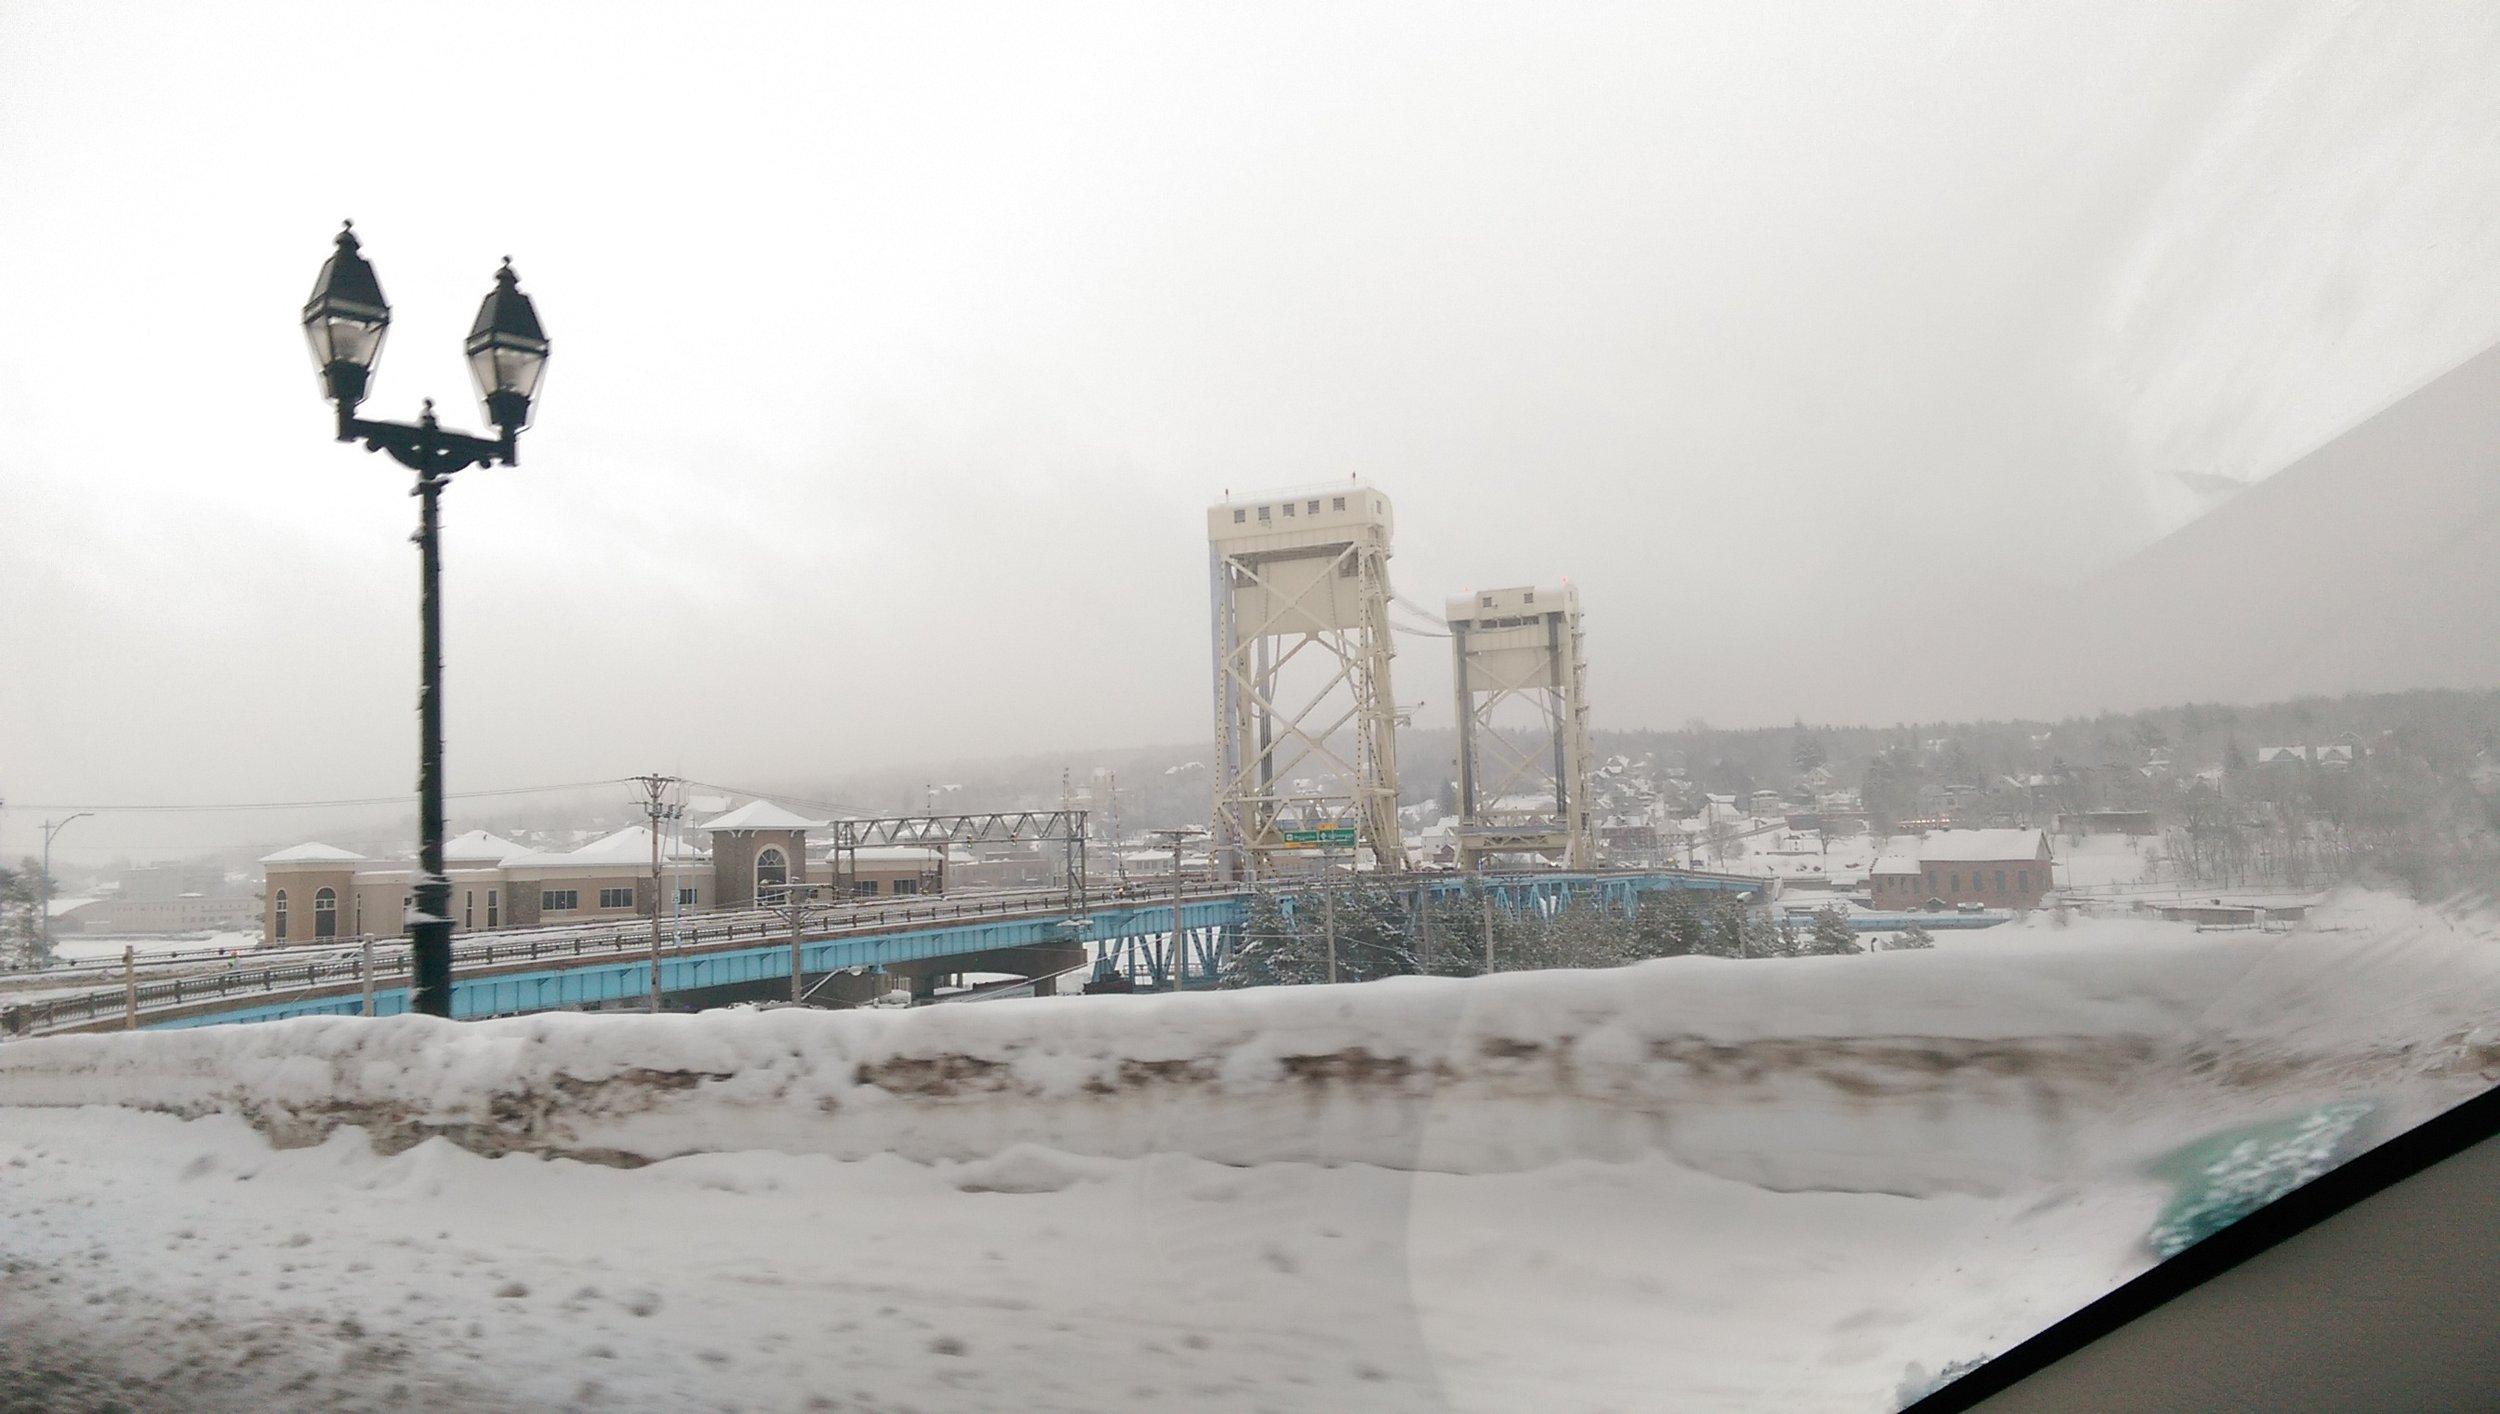 The Houghton-Hancock Lift Bridge as seen through my car's windshield.